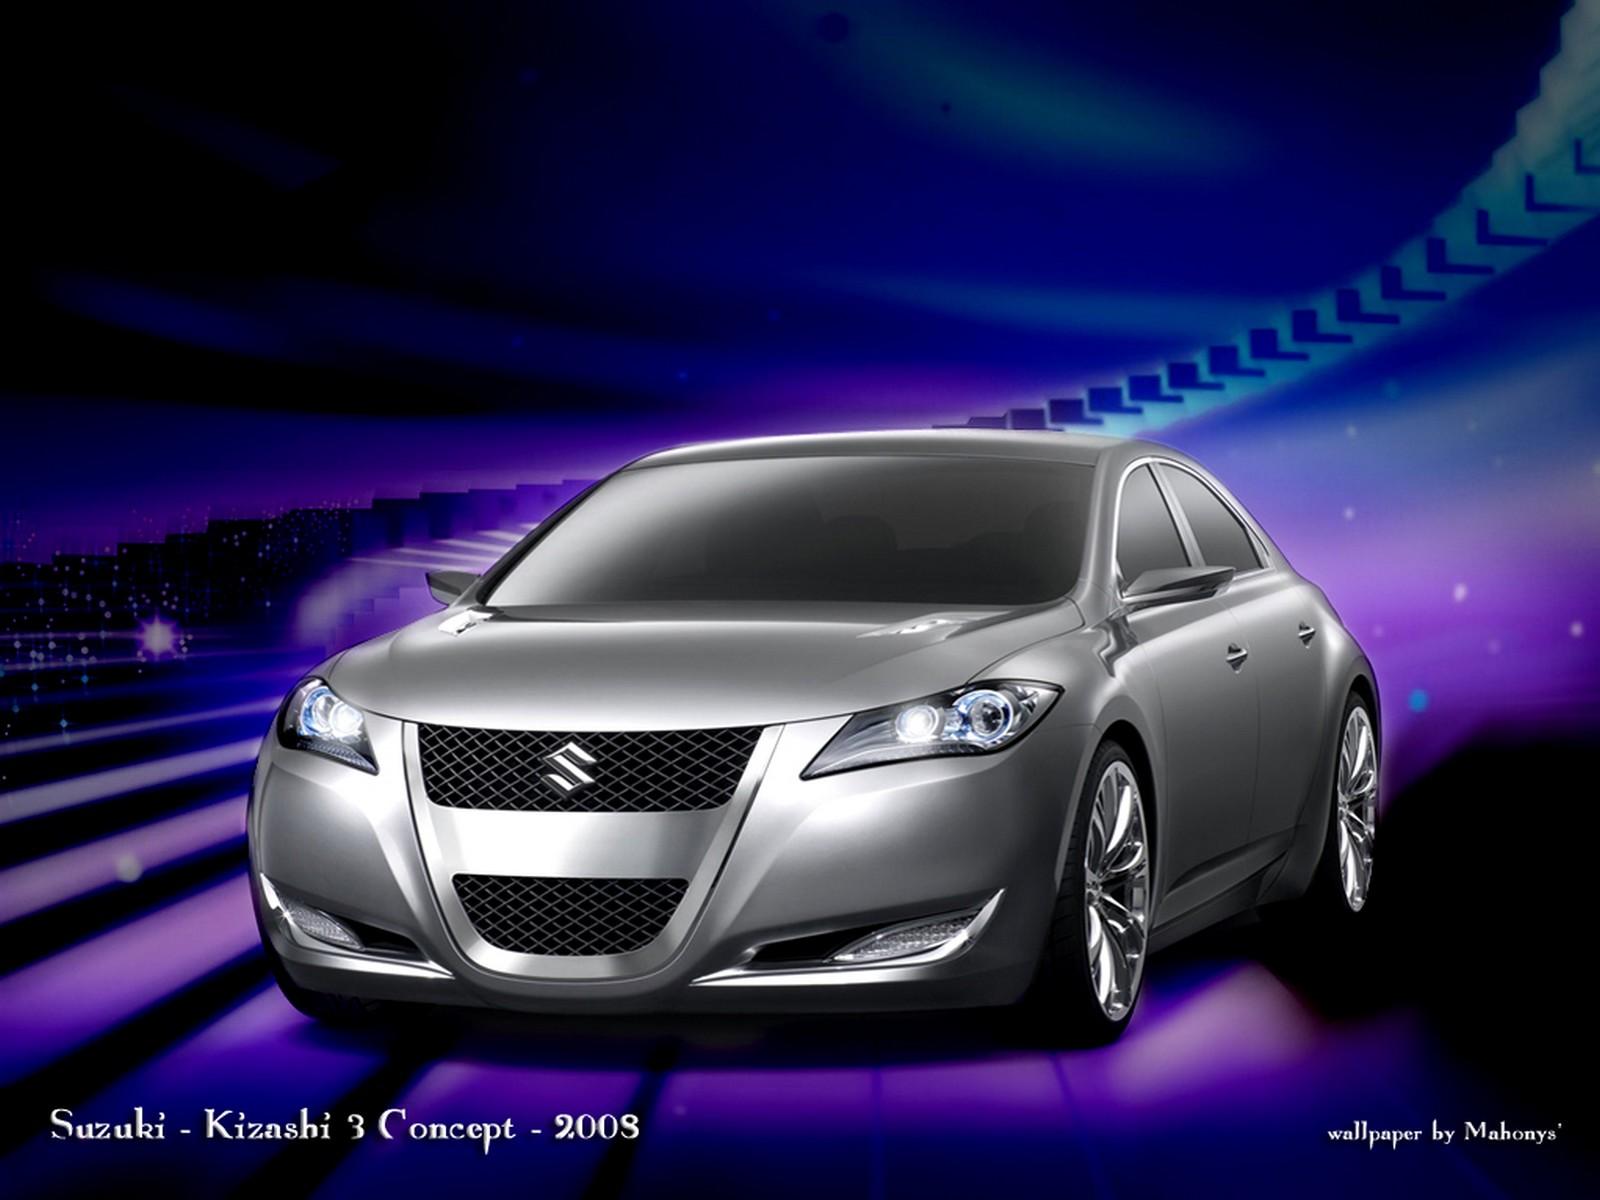 Photos Suzuki - Cars auto 1600x1200 Cars automobile